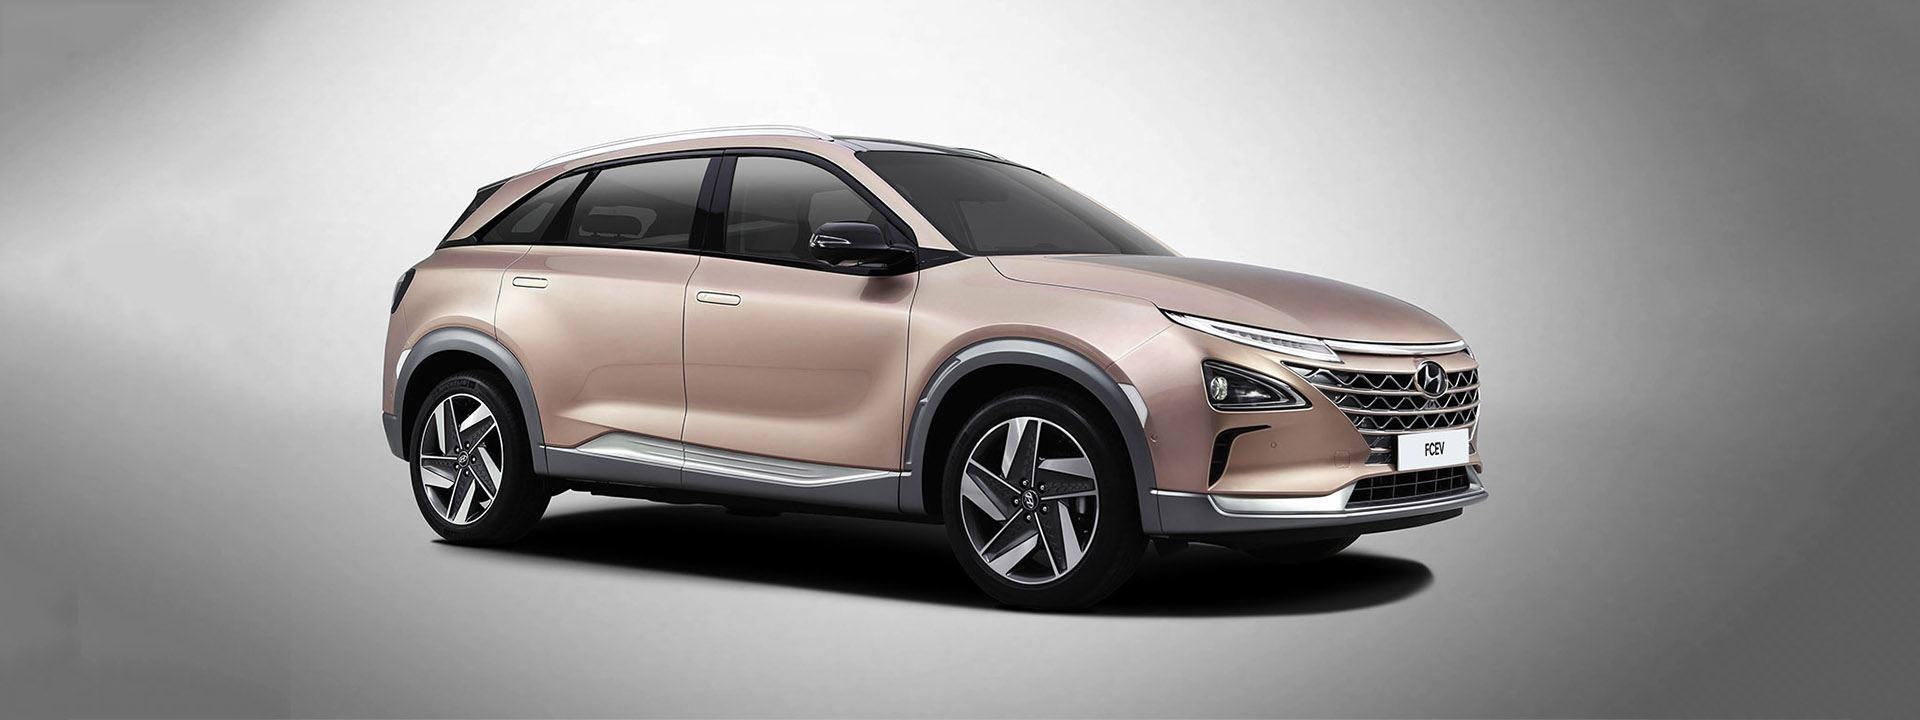 Nieuwe waterstofauto Hyundai op CES 2018